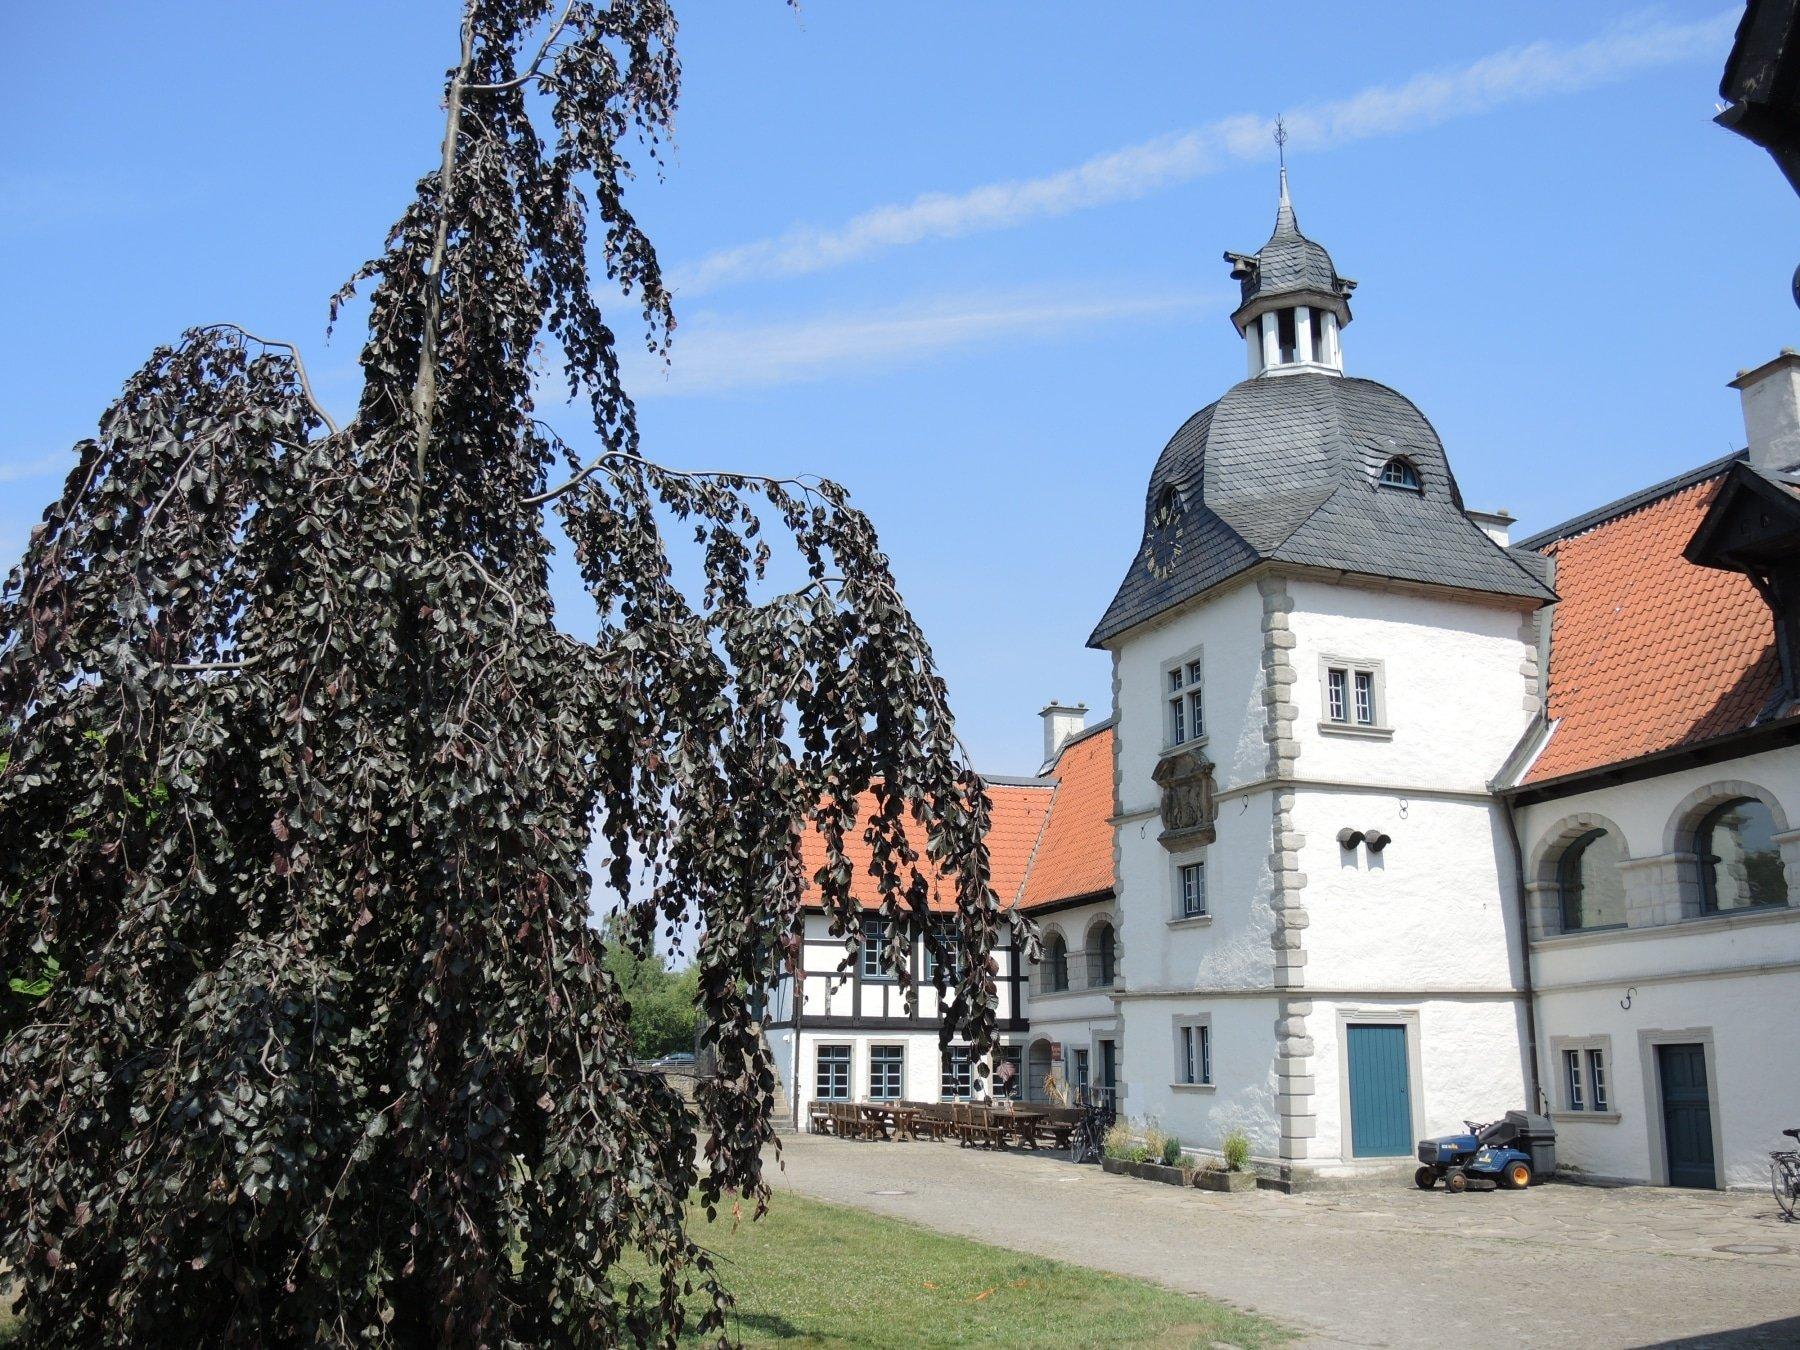 Der Kurs findet im Aplerbecker Wasserschloss Rodenberg statt. (Foto: IN-StadtMagazine)